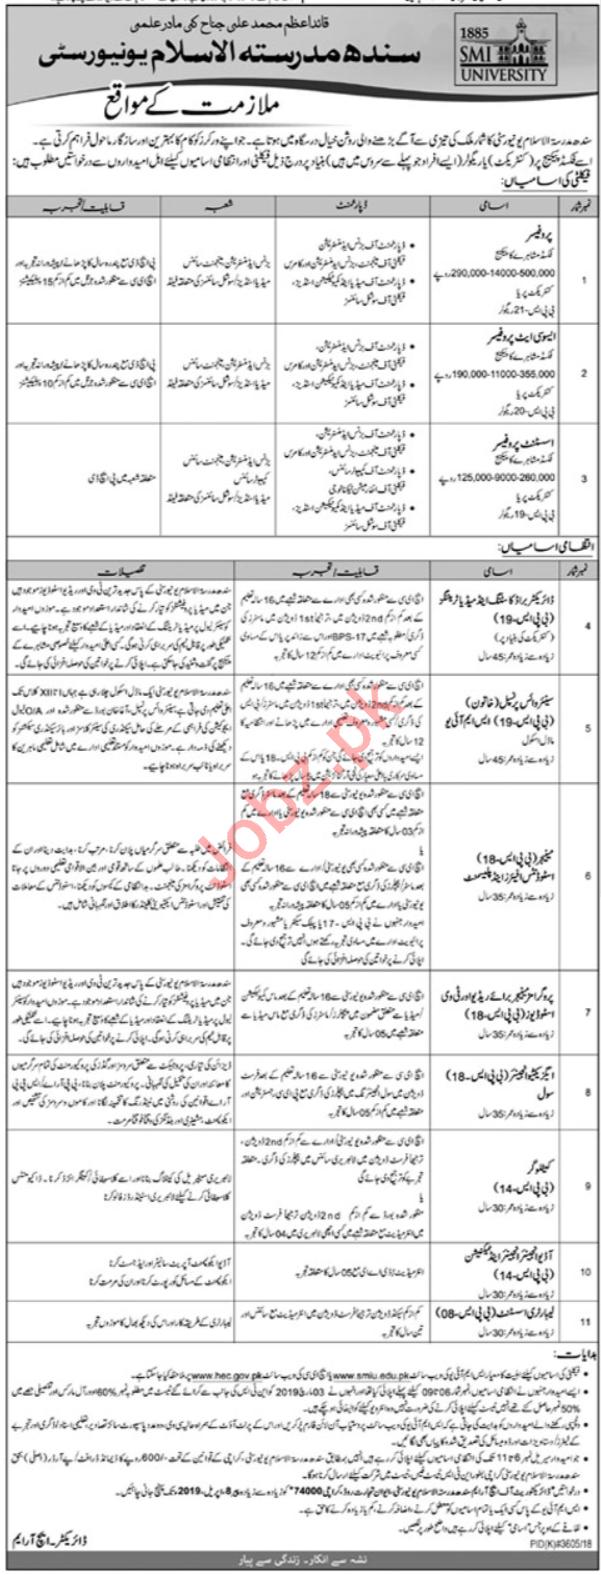 Sindh Madressatul Islam University SMIU Karachi Jobs 2019